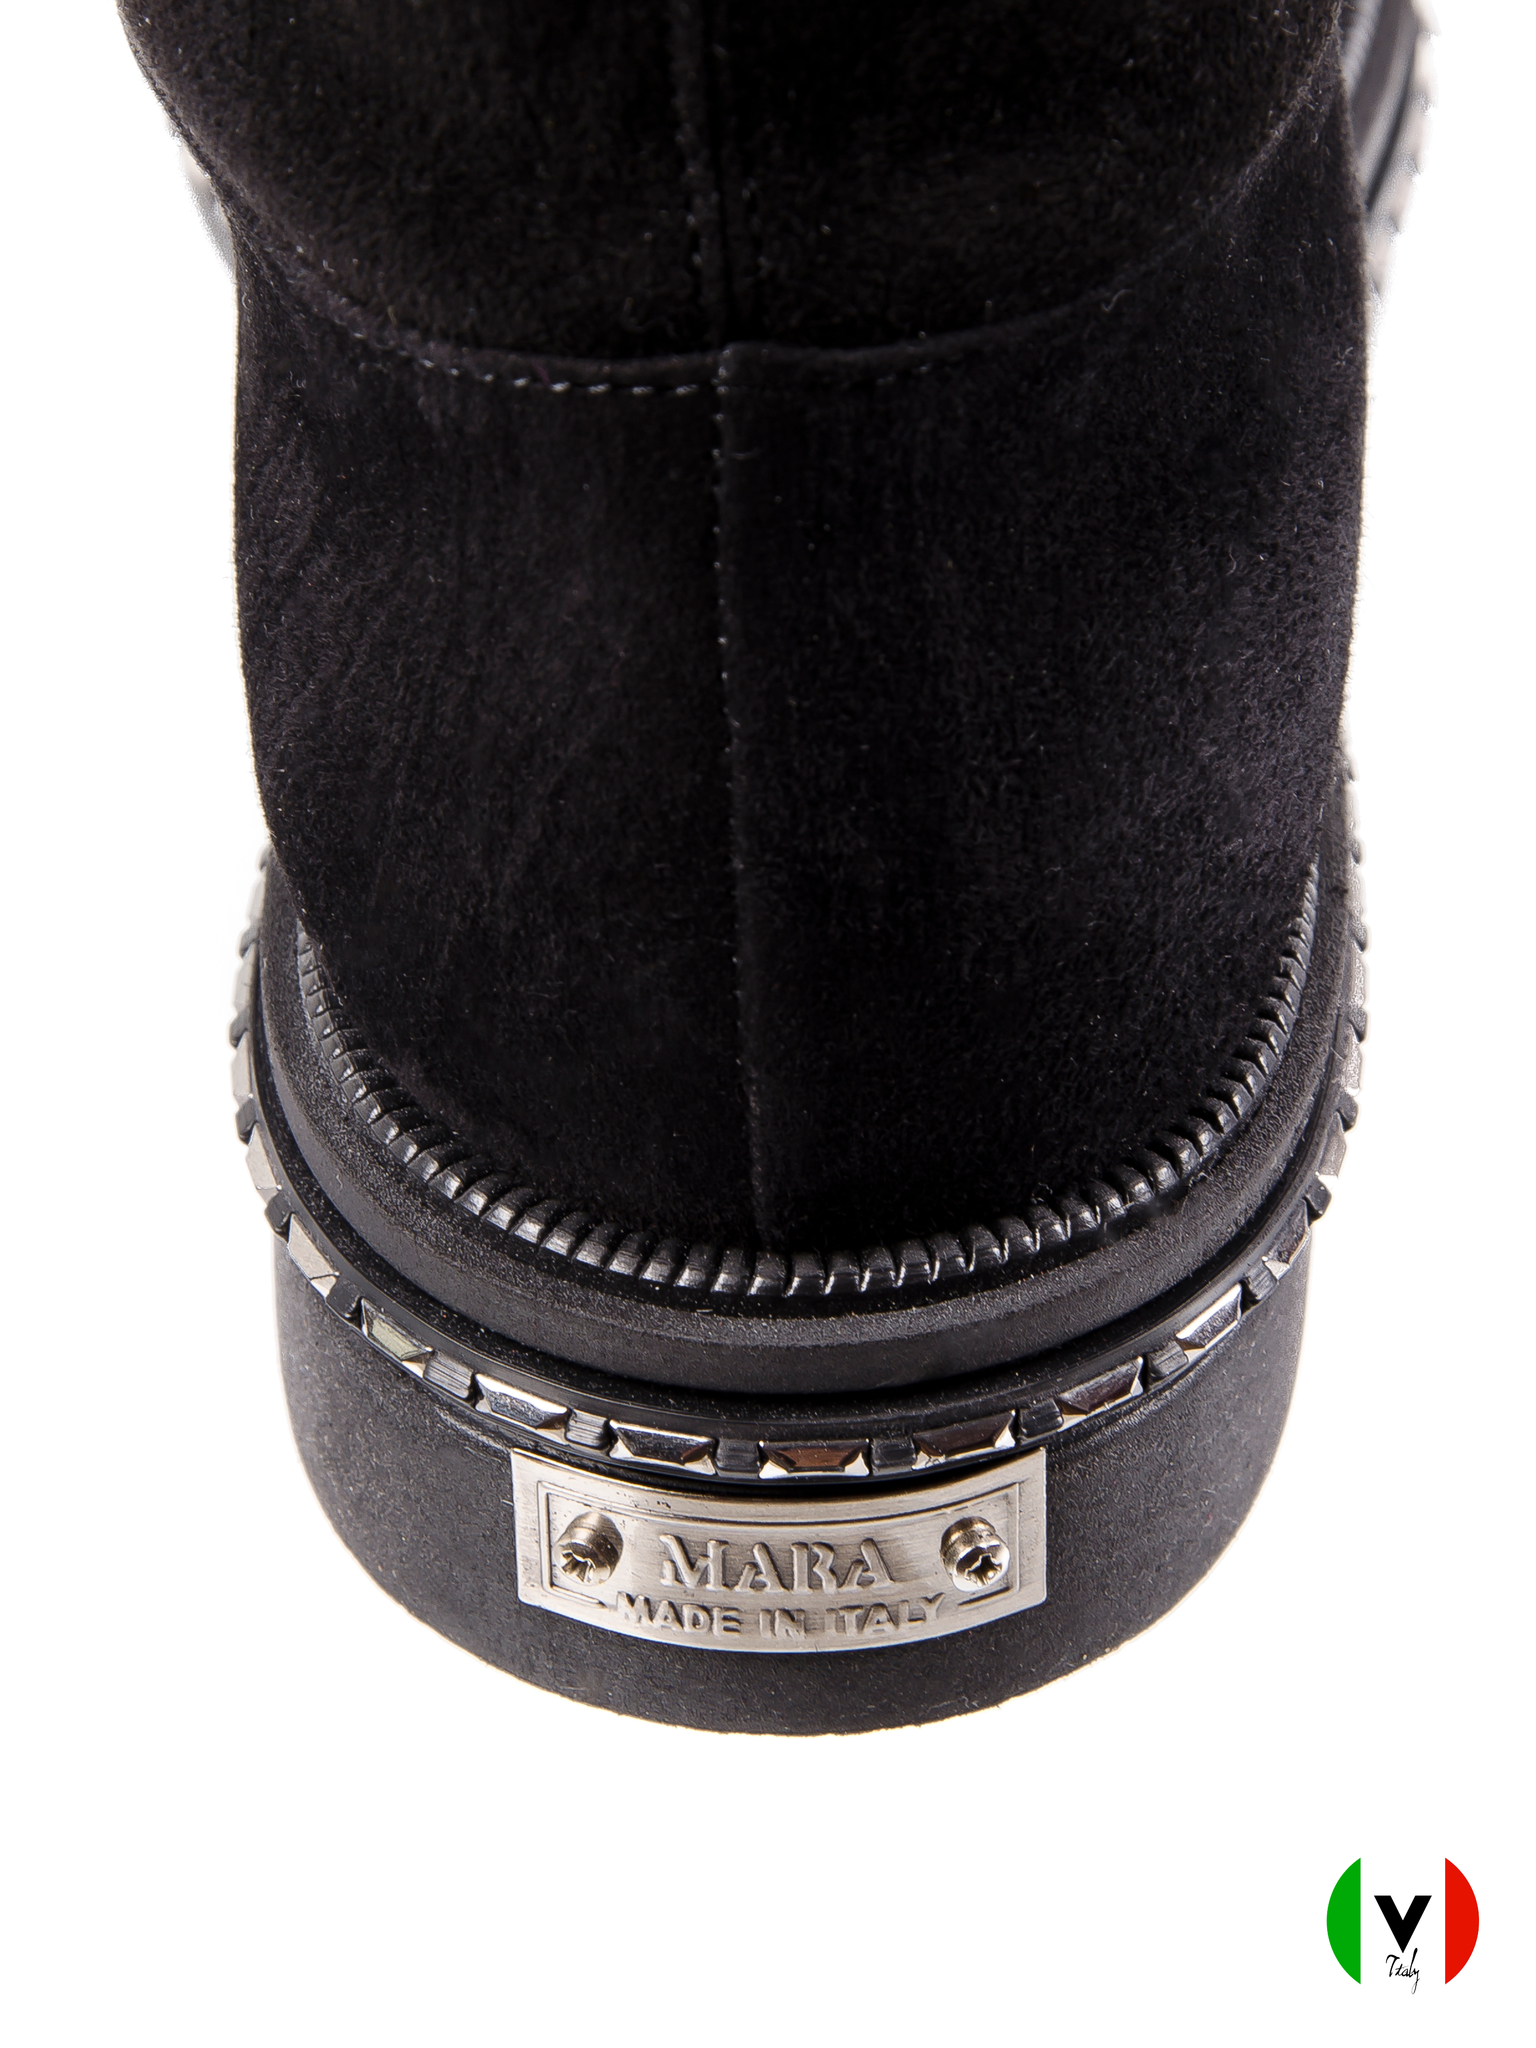 Ботинки Mara, артикул 683-зима-замша, сезон зима, цвет чёрный, материал кожа, цена 23 500 руб., veroitaly.ru